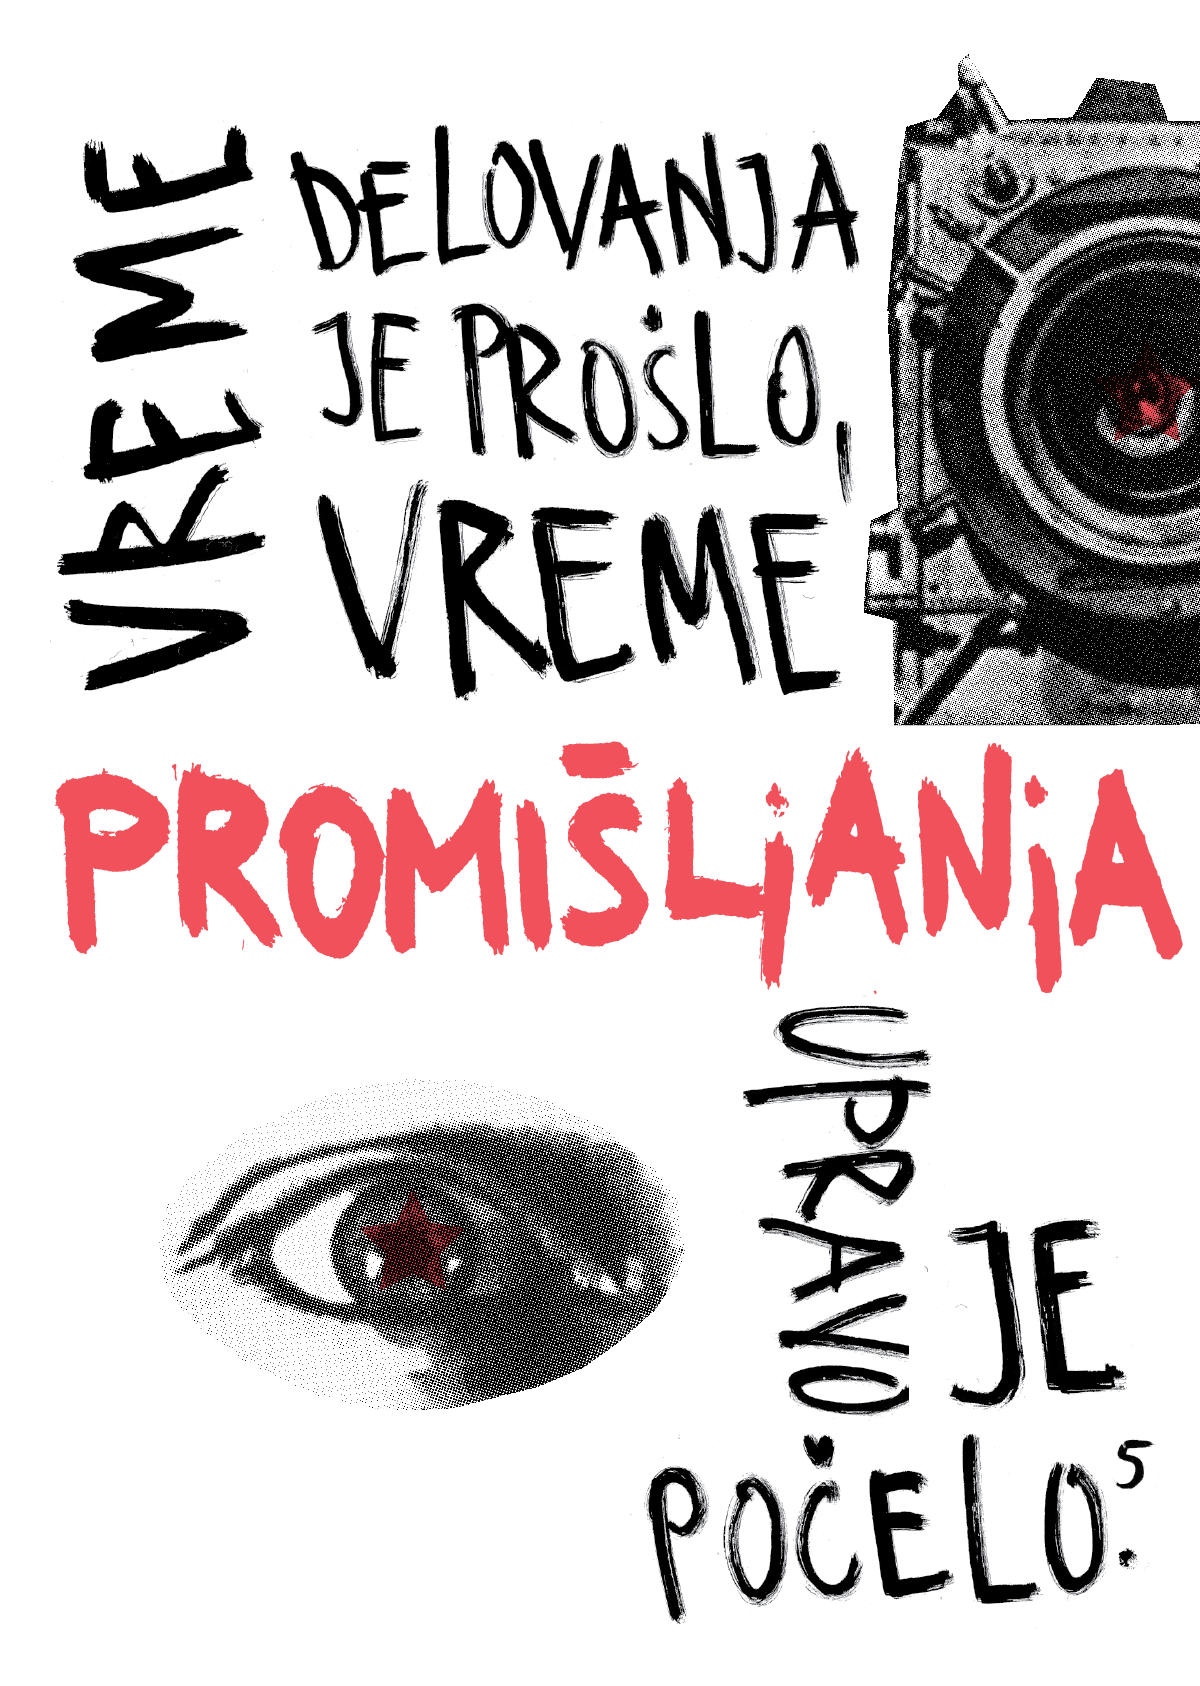 poster-rs-zidne-br-7-film kao sredstvo web